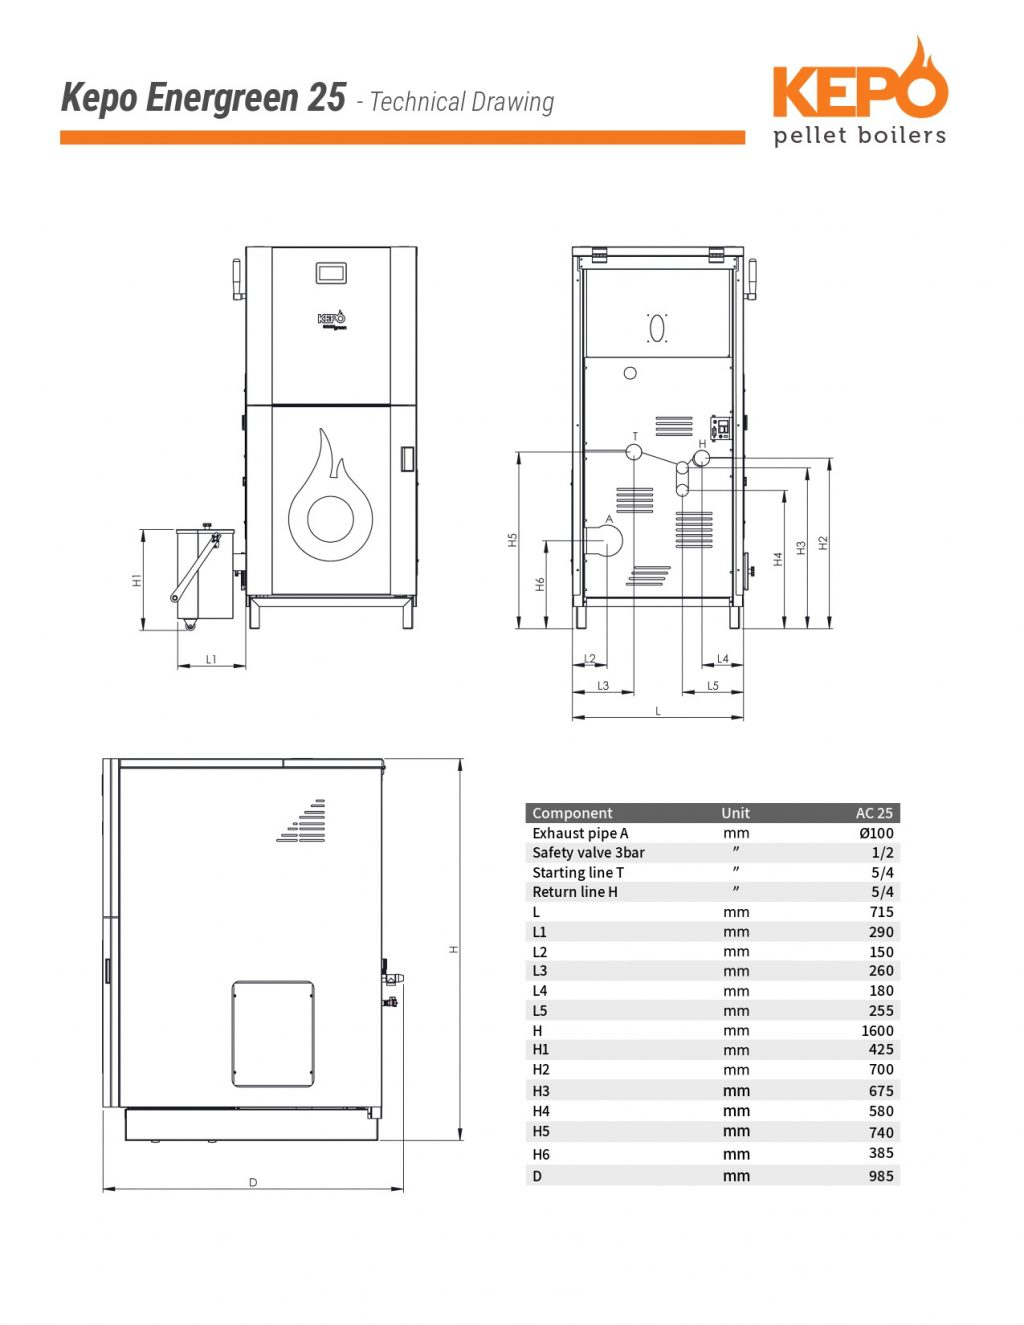 Kepo Energreen25 Techical Drawing